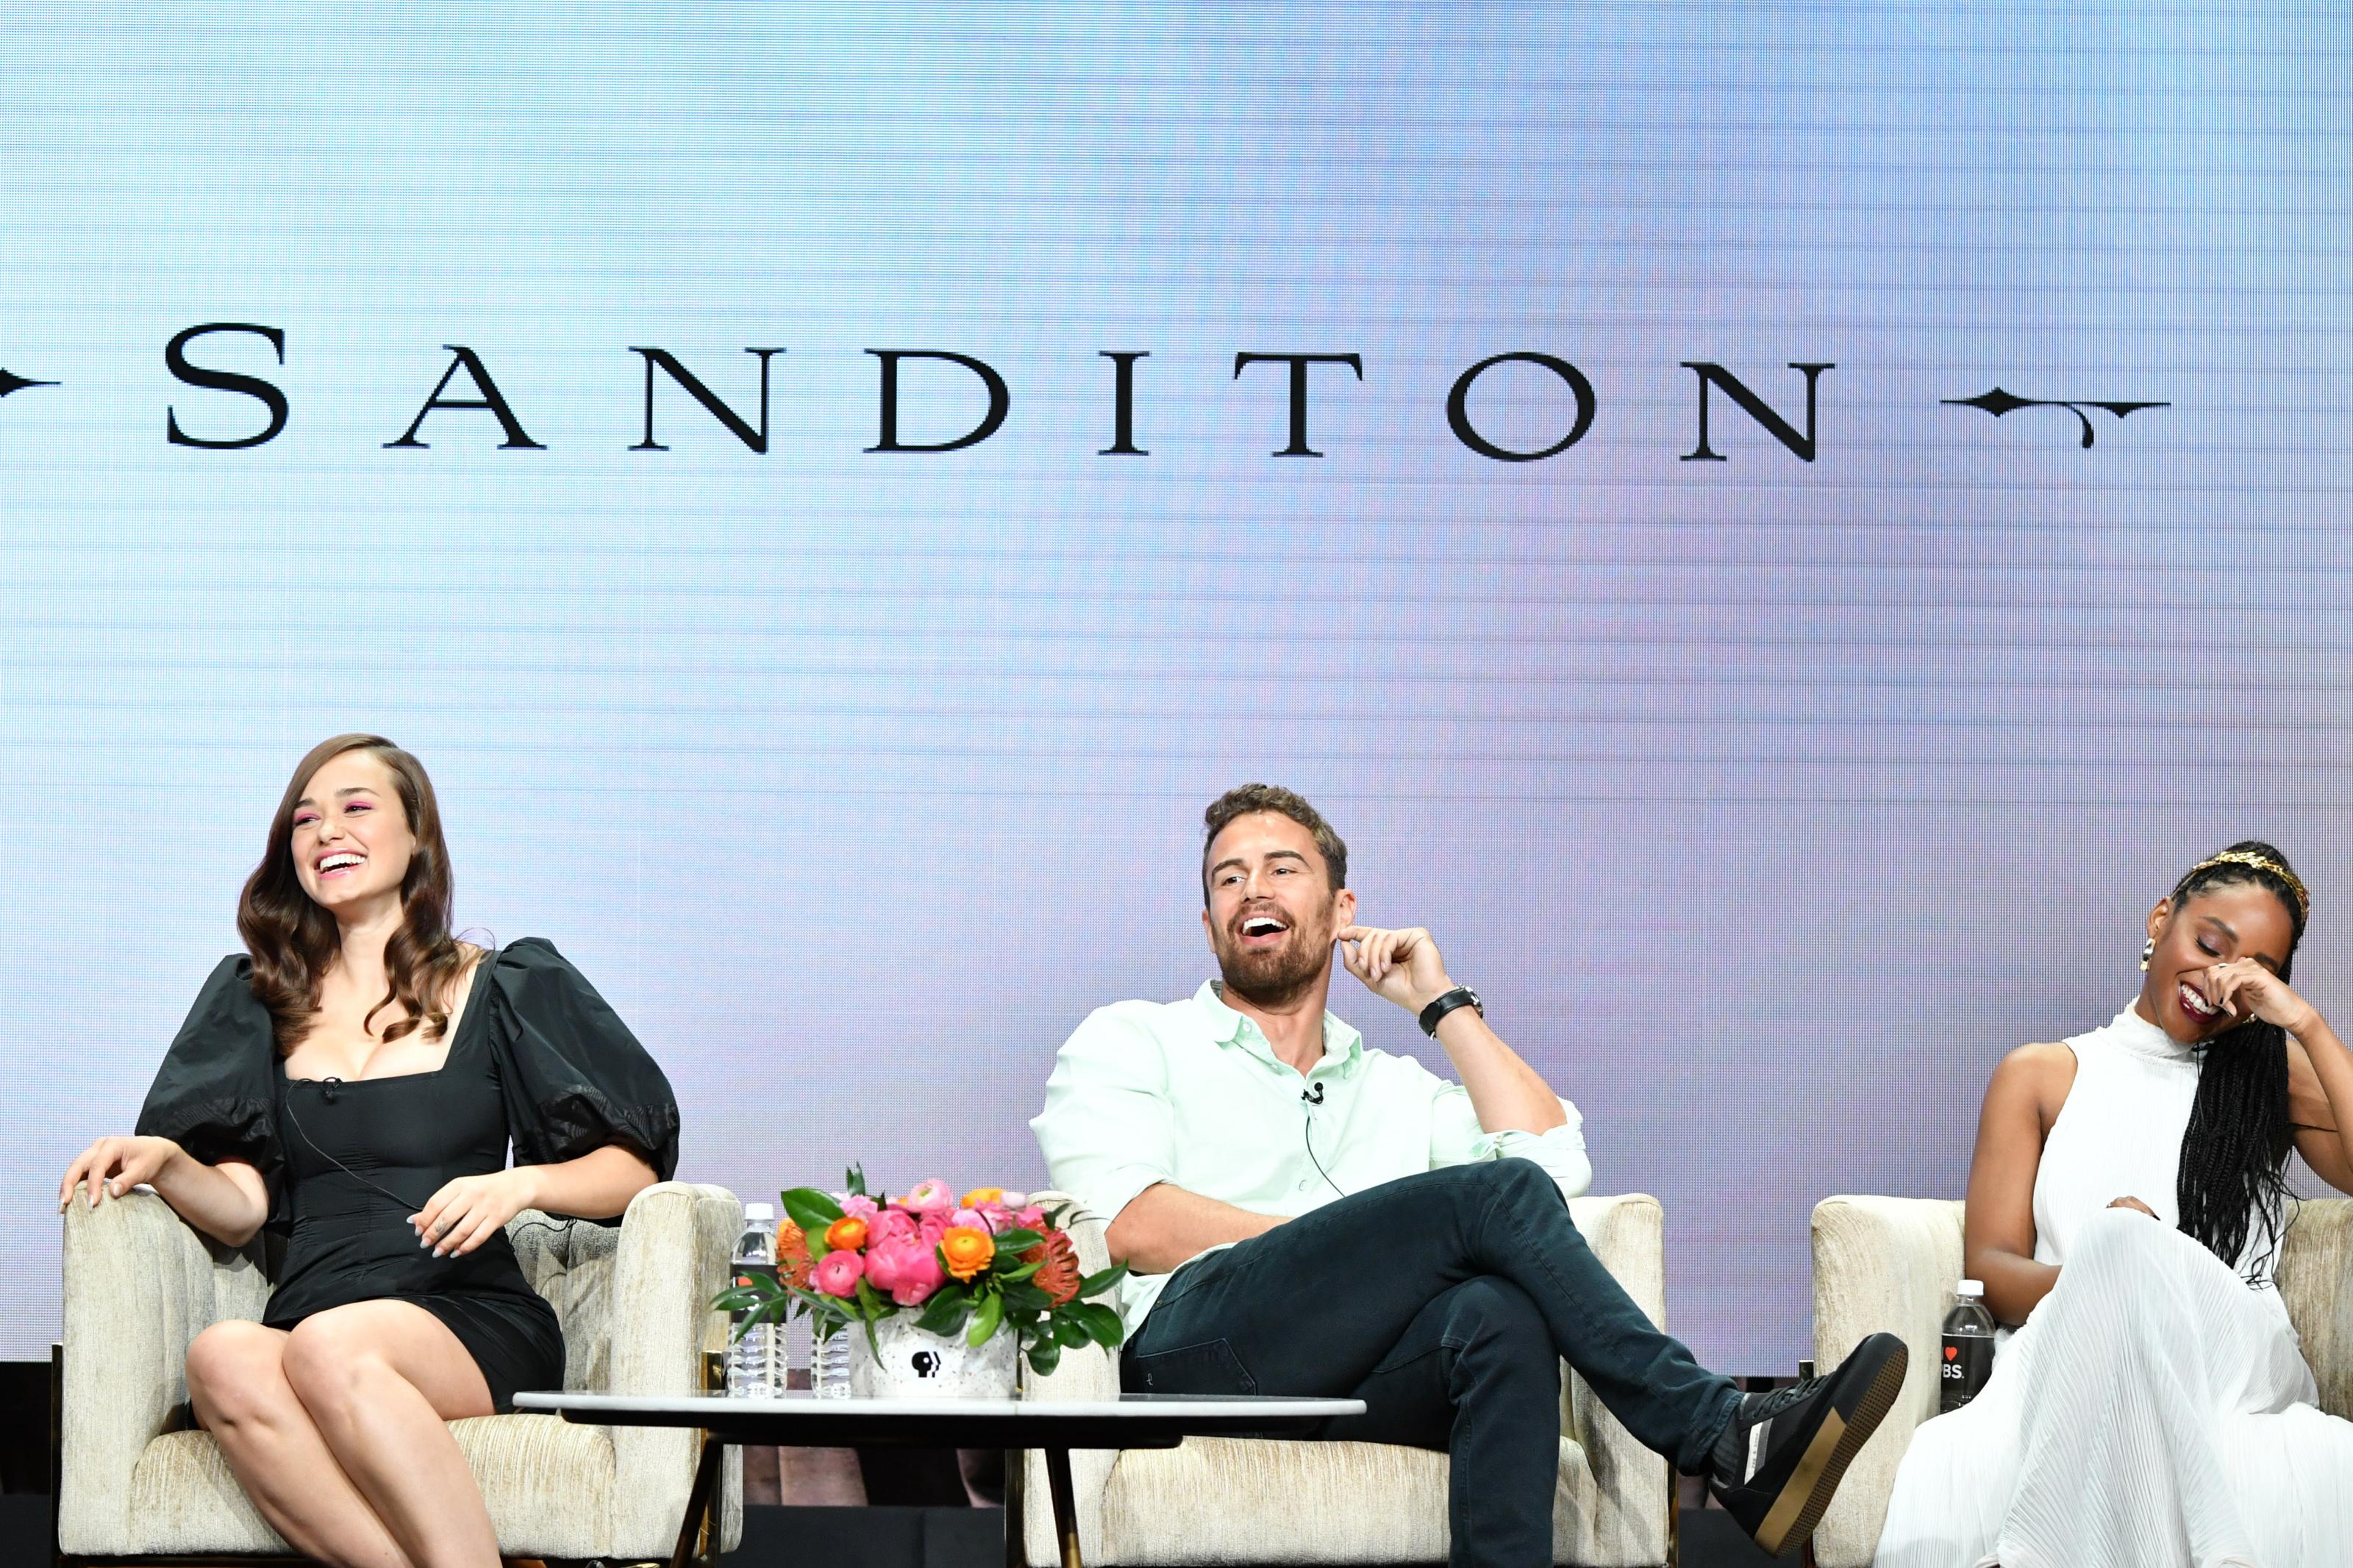 Is Sanditon On Netflix Where To Watch Sanditon